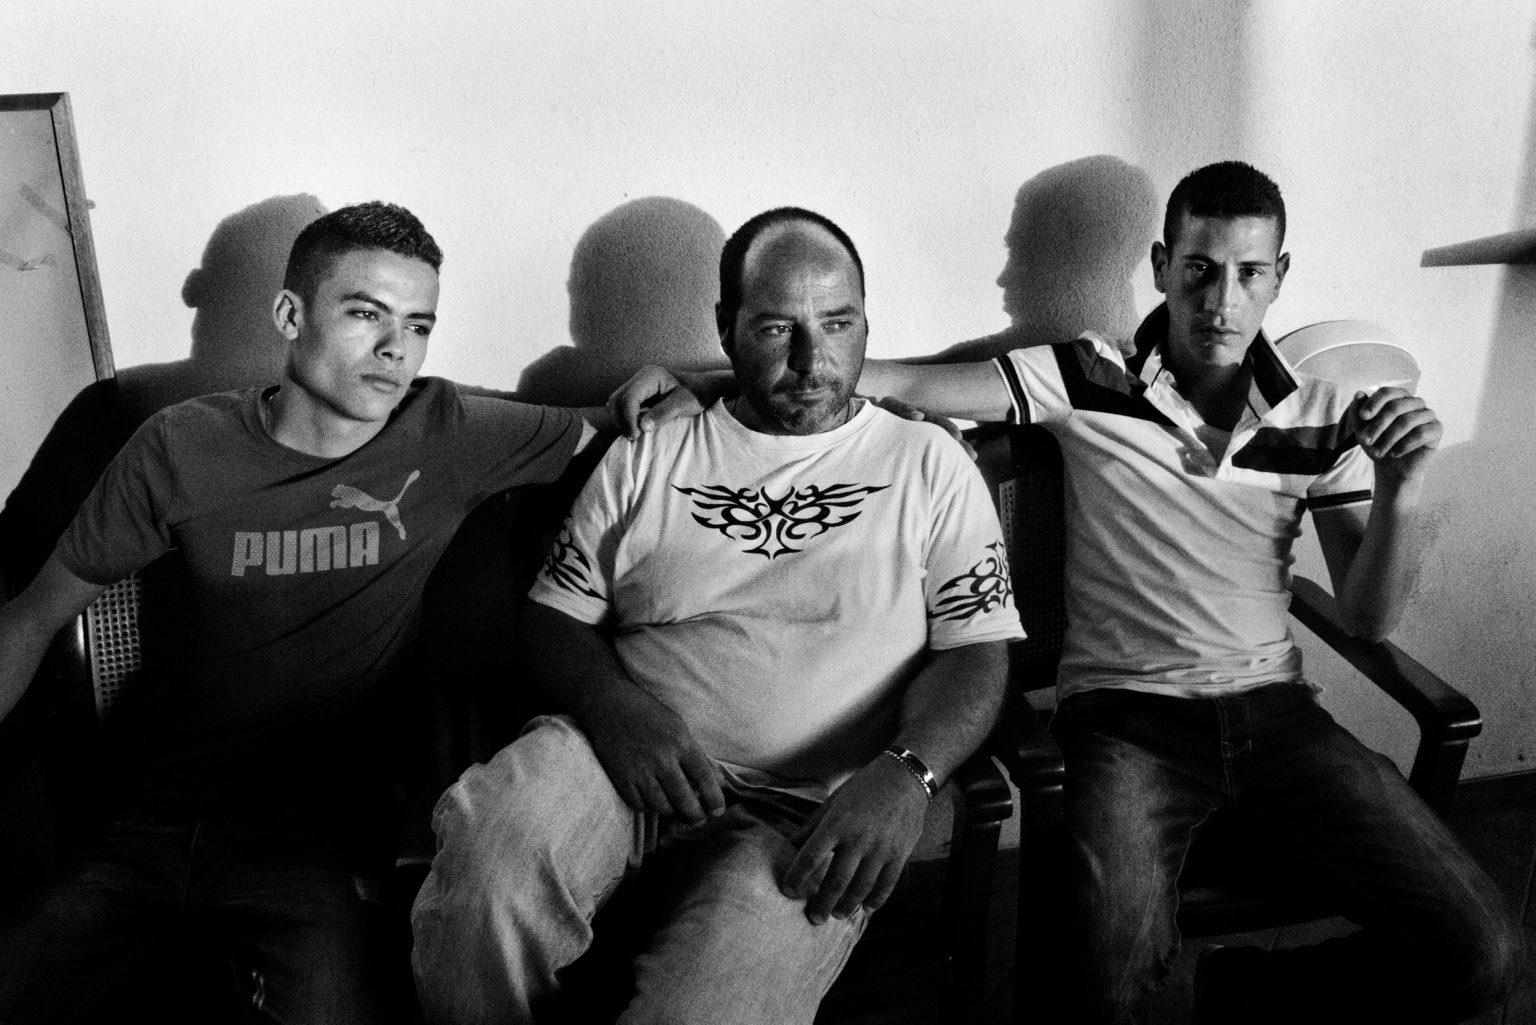 Lampedusa, April 2011-The story of Ahmed, one of the many young Tunisians landed on Lampedusa. Ahmed, a 23-year-old Tunisian who was being looked after by the Matinas, a Lampedusans family. The family gave him a bed, clothes,food, and they lived togheter for a year.Ahmed on the island.   Lampedusa, aprile 2011-La storia di Ahmed, uno dei tanti giovani tunisini sbarcati a Lampedusa. Ahmed, un tunisino di 23 anniè stato accudito dai Matinas, una famiglia lampedusana. La famiglia gli ha dato un letto, dei vestiti e  cibo. Hanno vissuto insieme per un anno.Ahmed sull'isola.